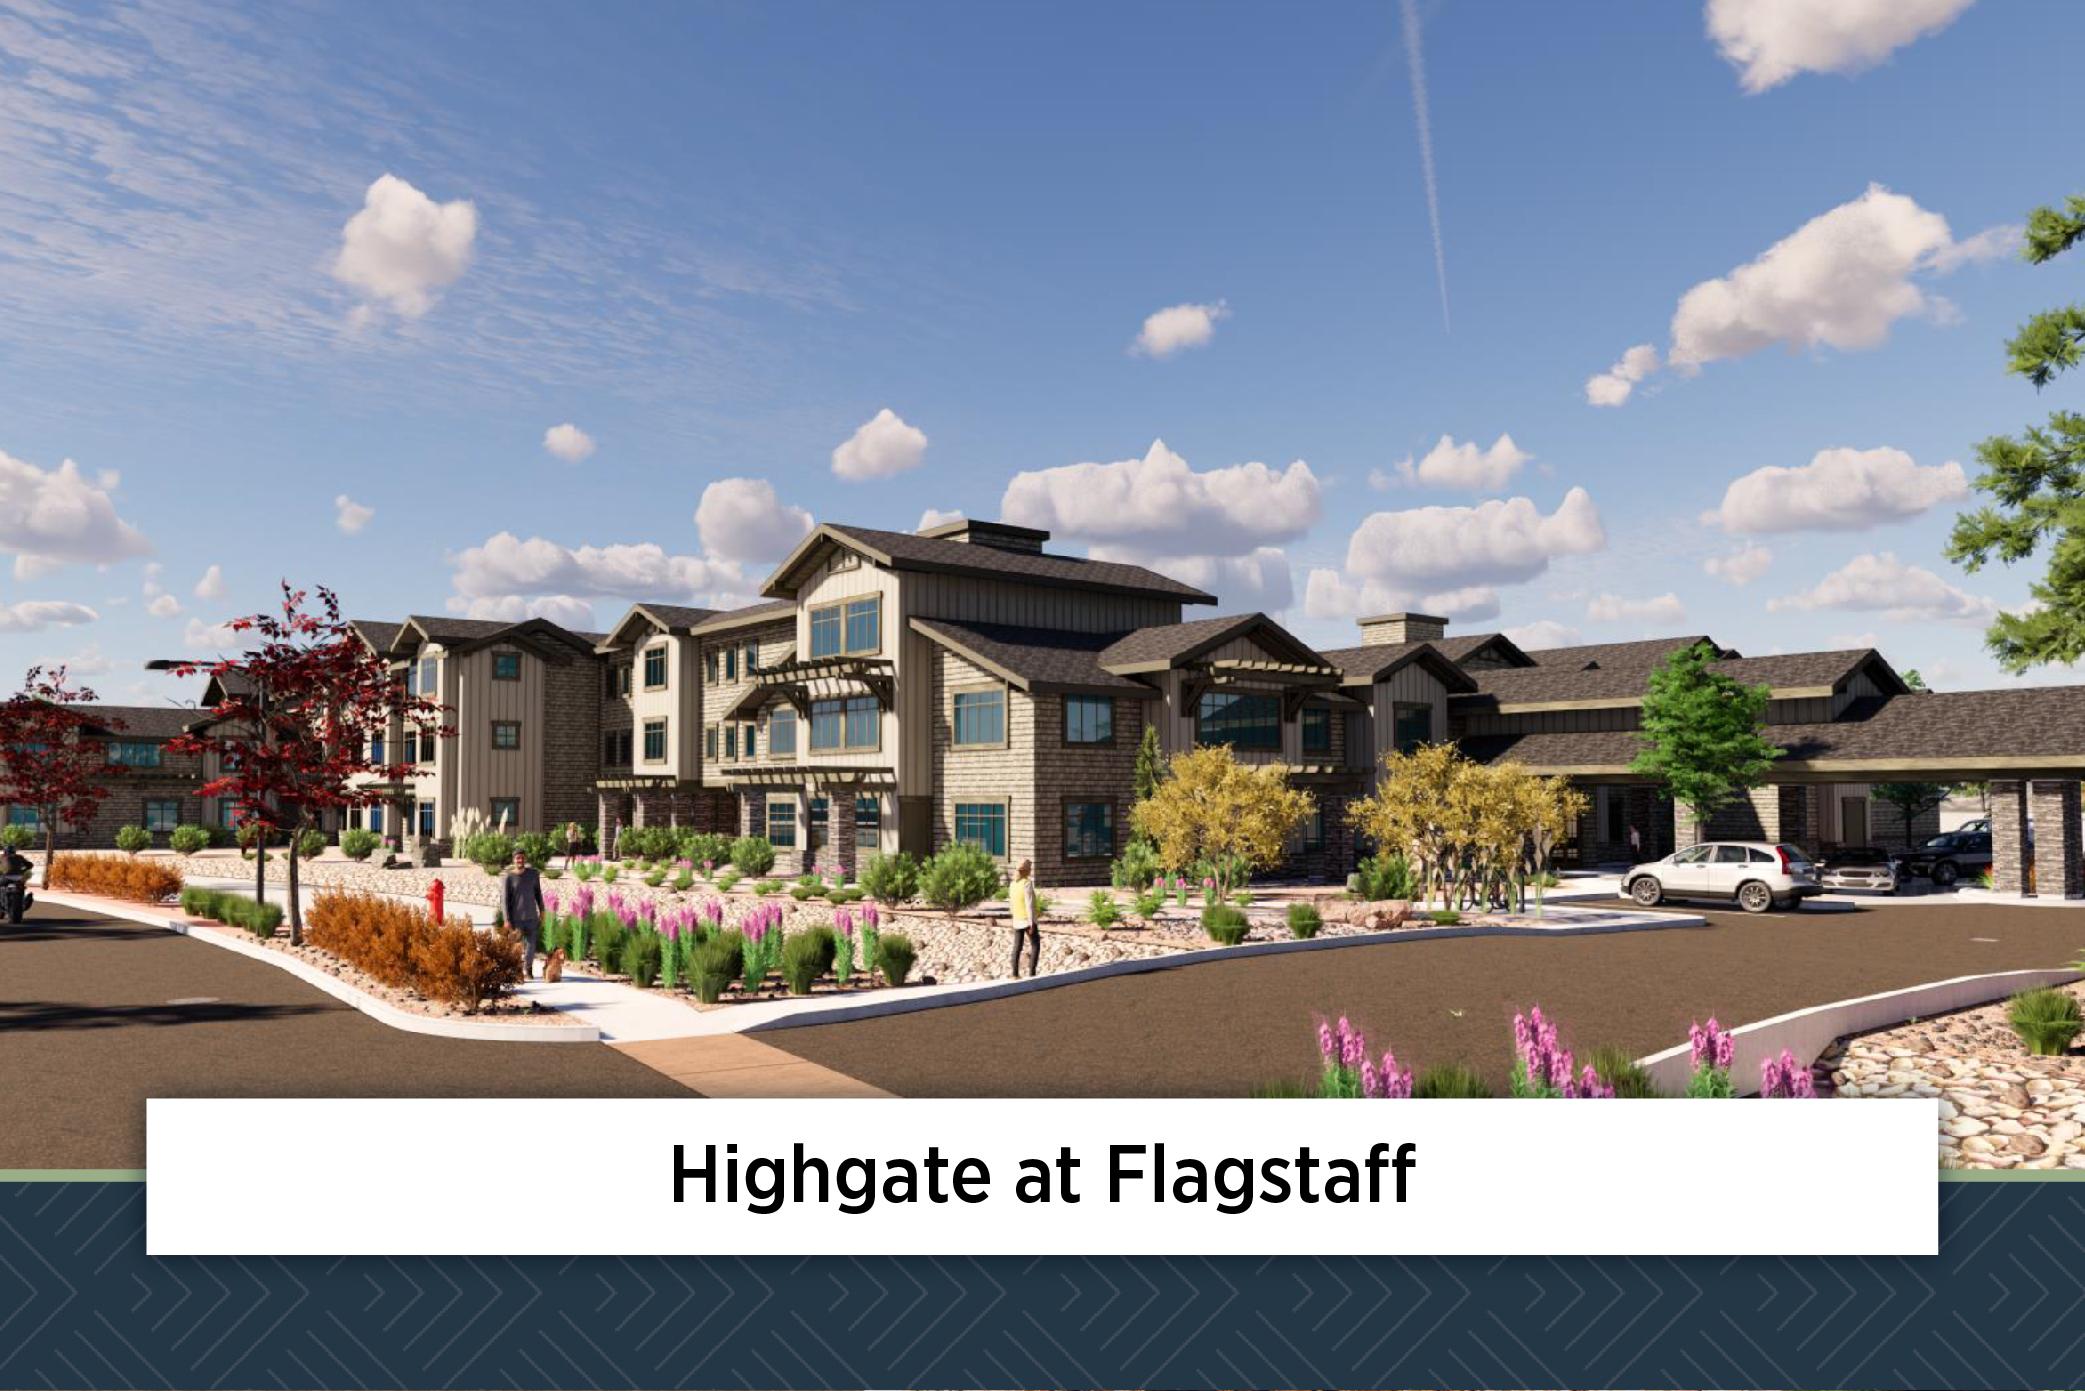 Highgate at Flagstaff